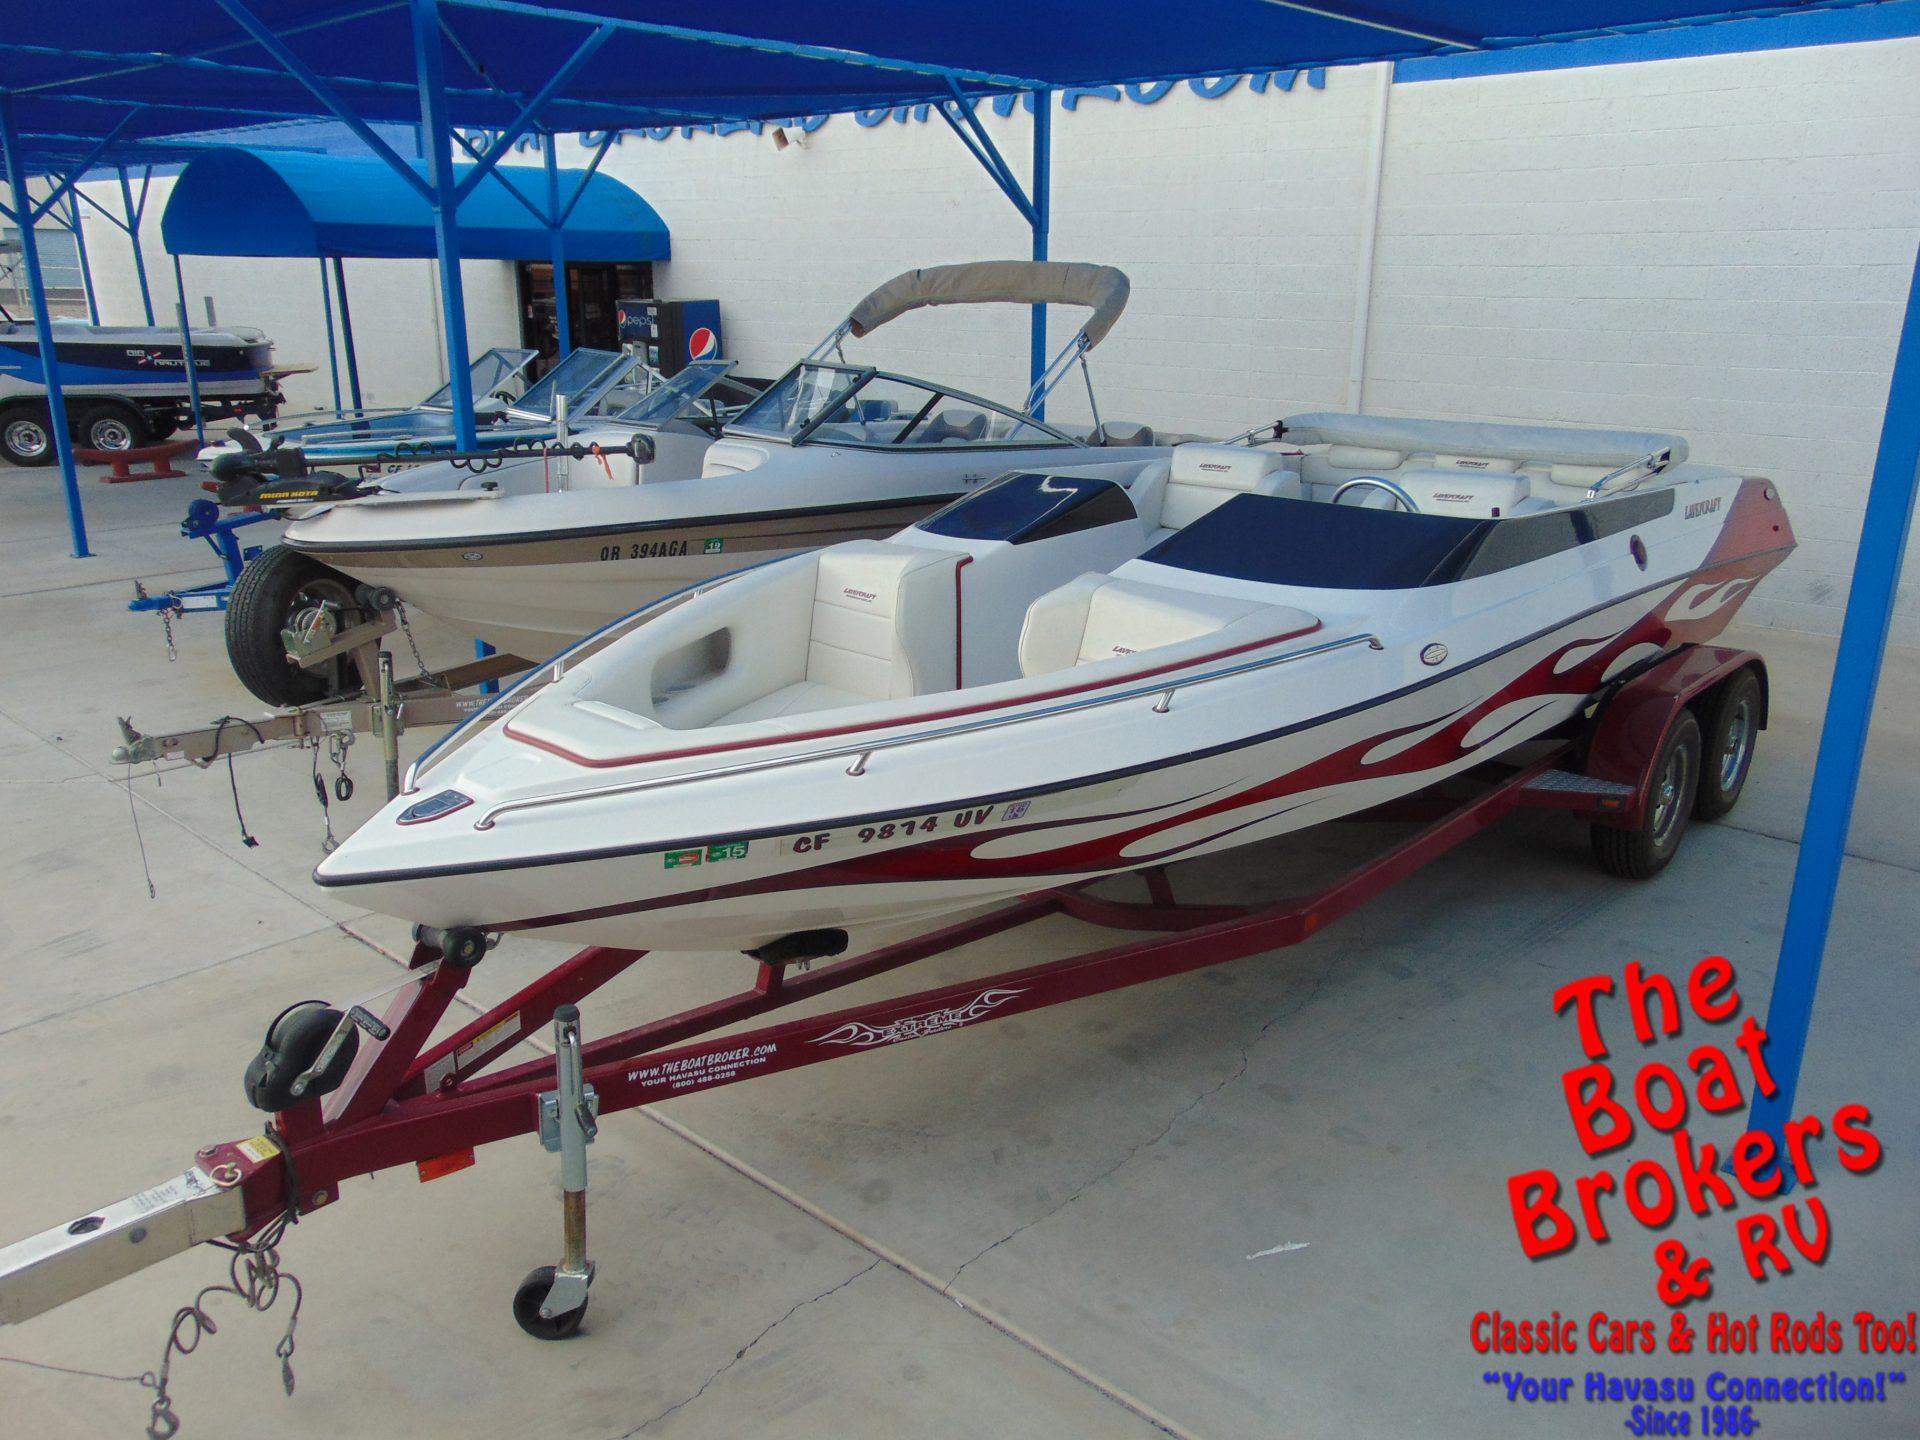 Lavey Craft Jet Boat